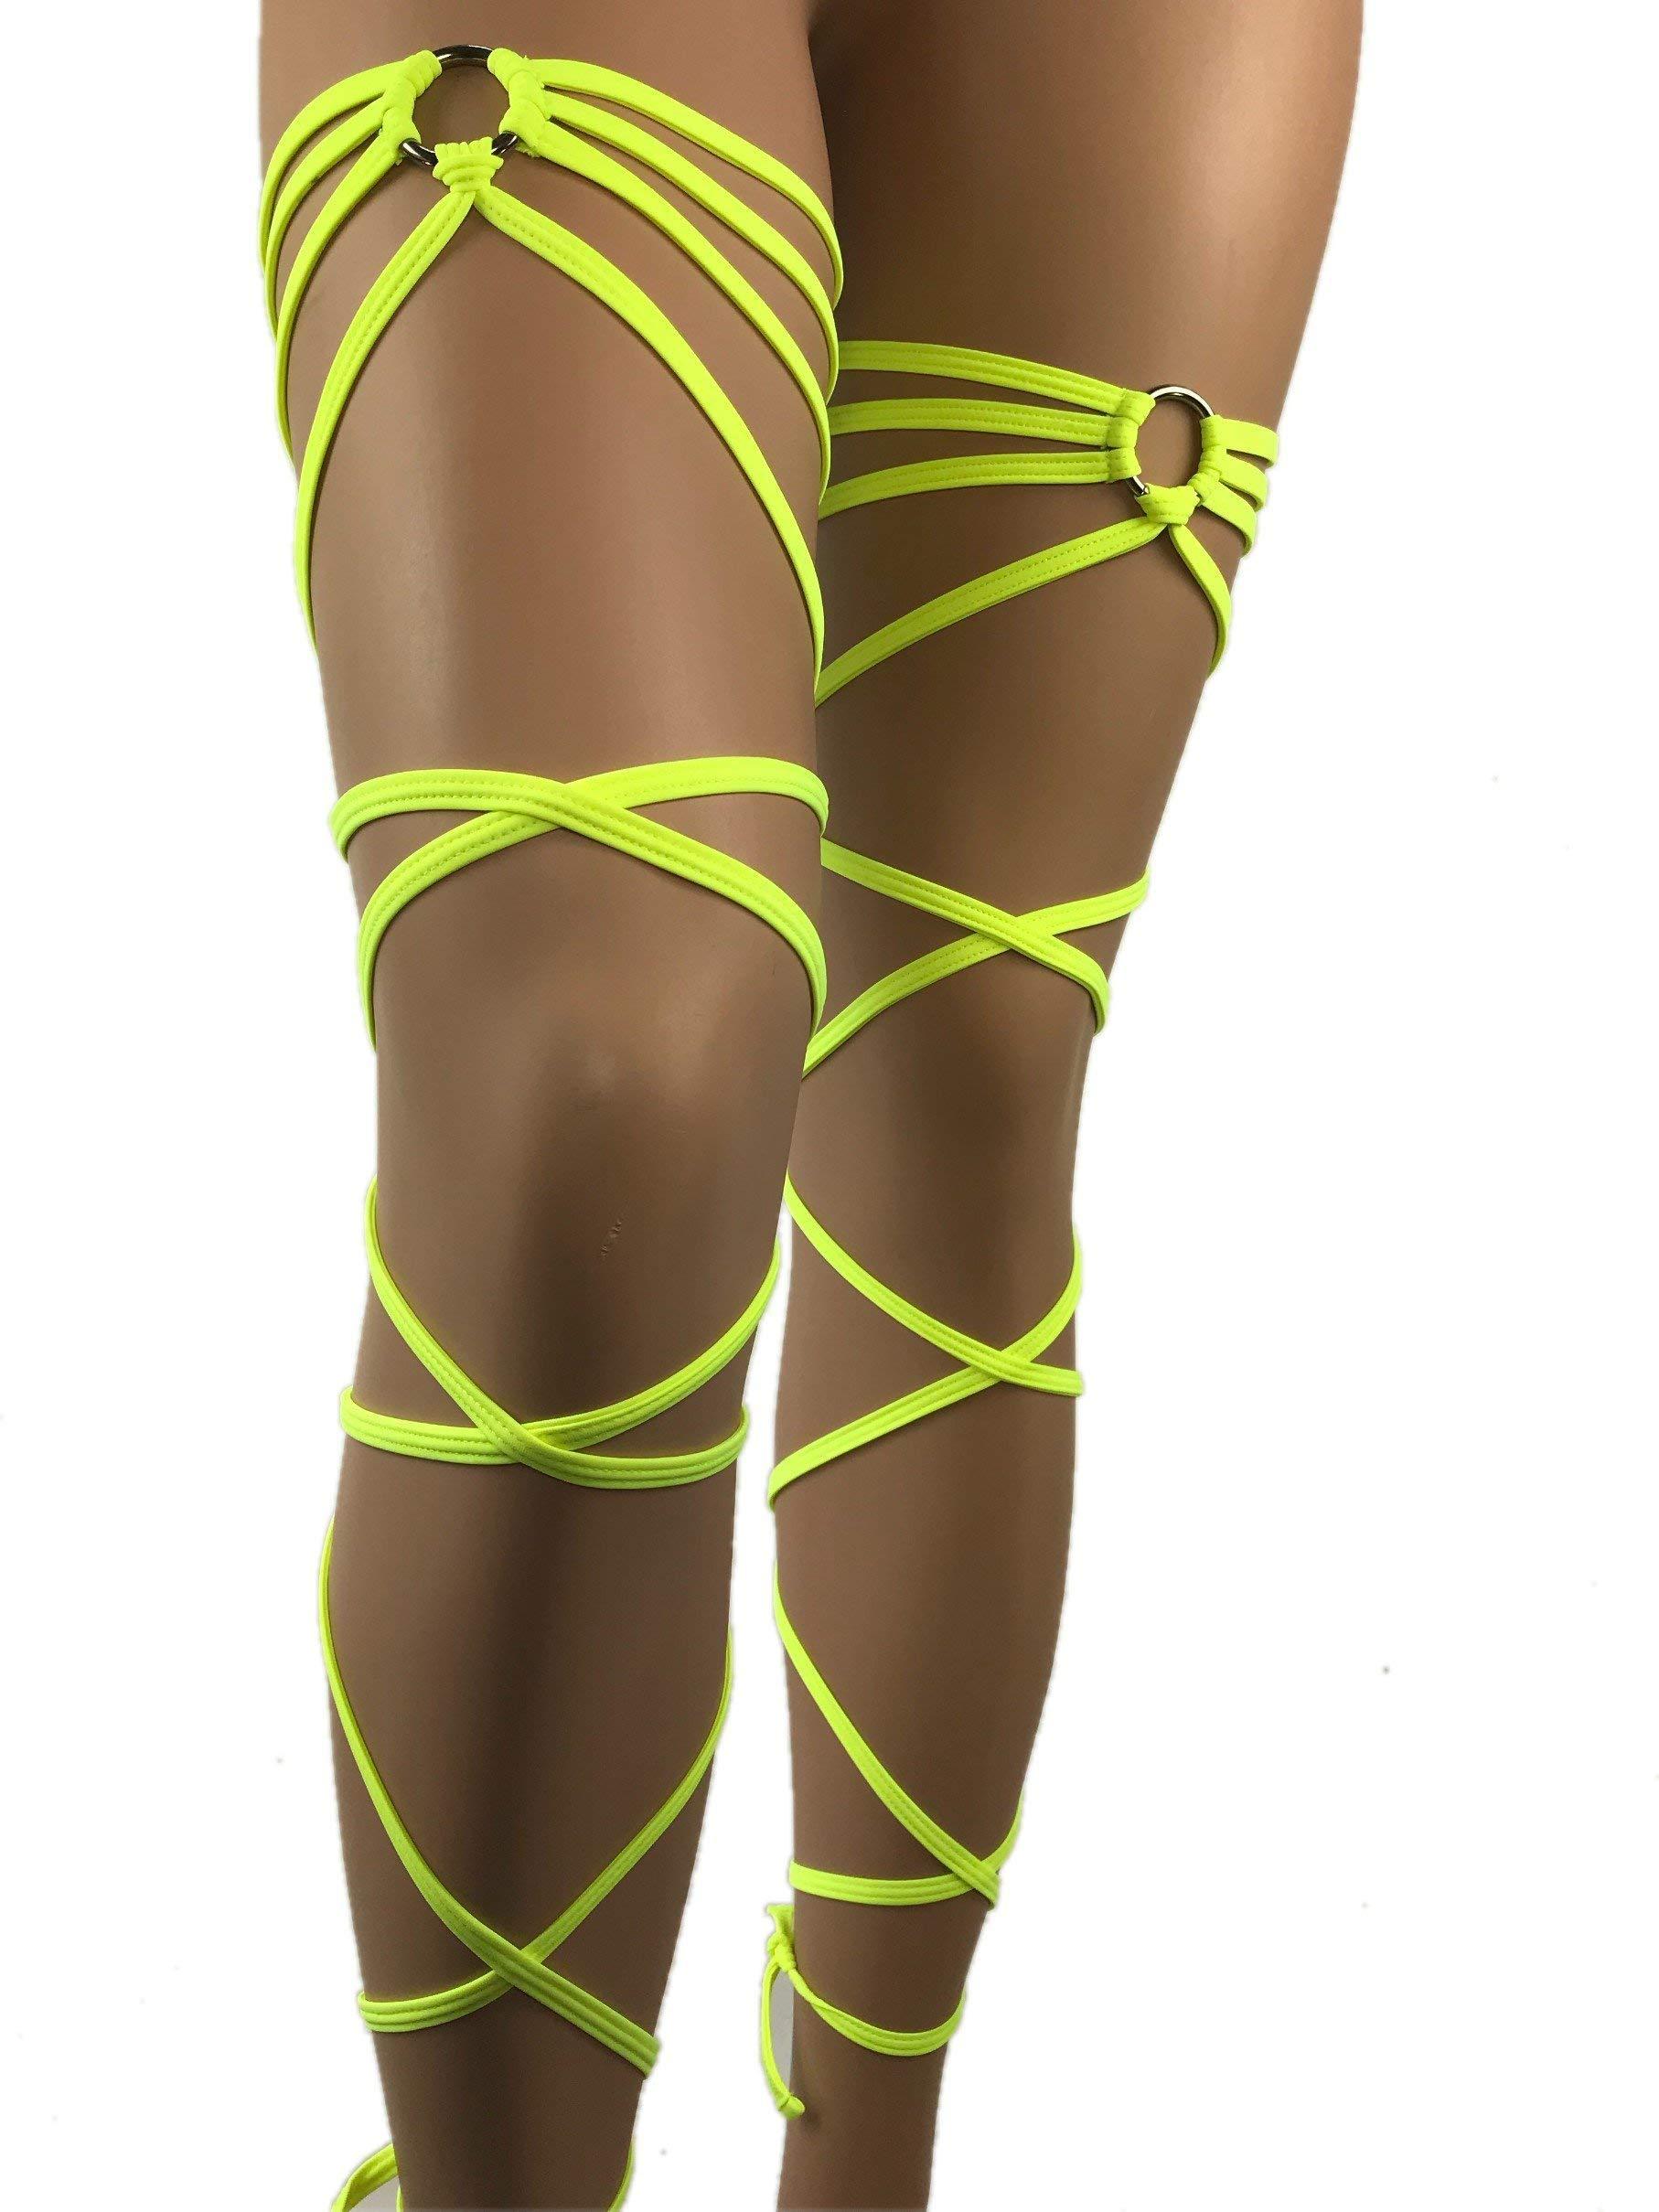 Exotic Dancewear Leg Wraps Rave neon glow UV Gartinis Garter Outfits Club Style Women's Intimates Rave Fashion Garter Club wear Rave Girl